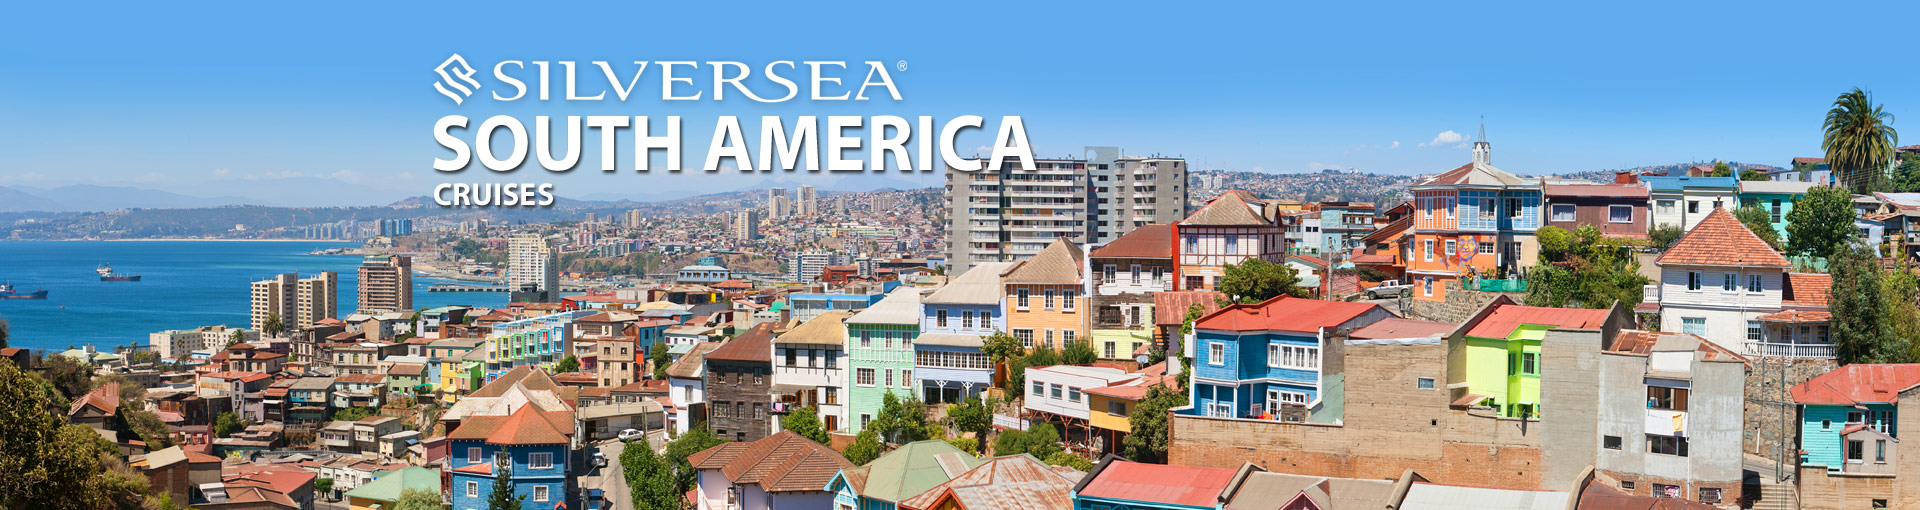 Silversea Cruises South America Cruises